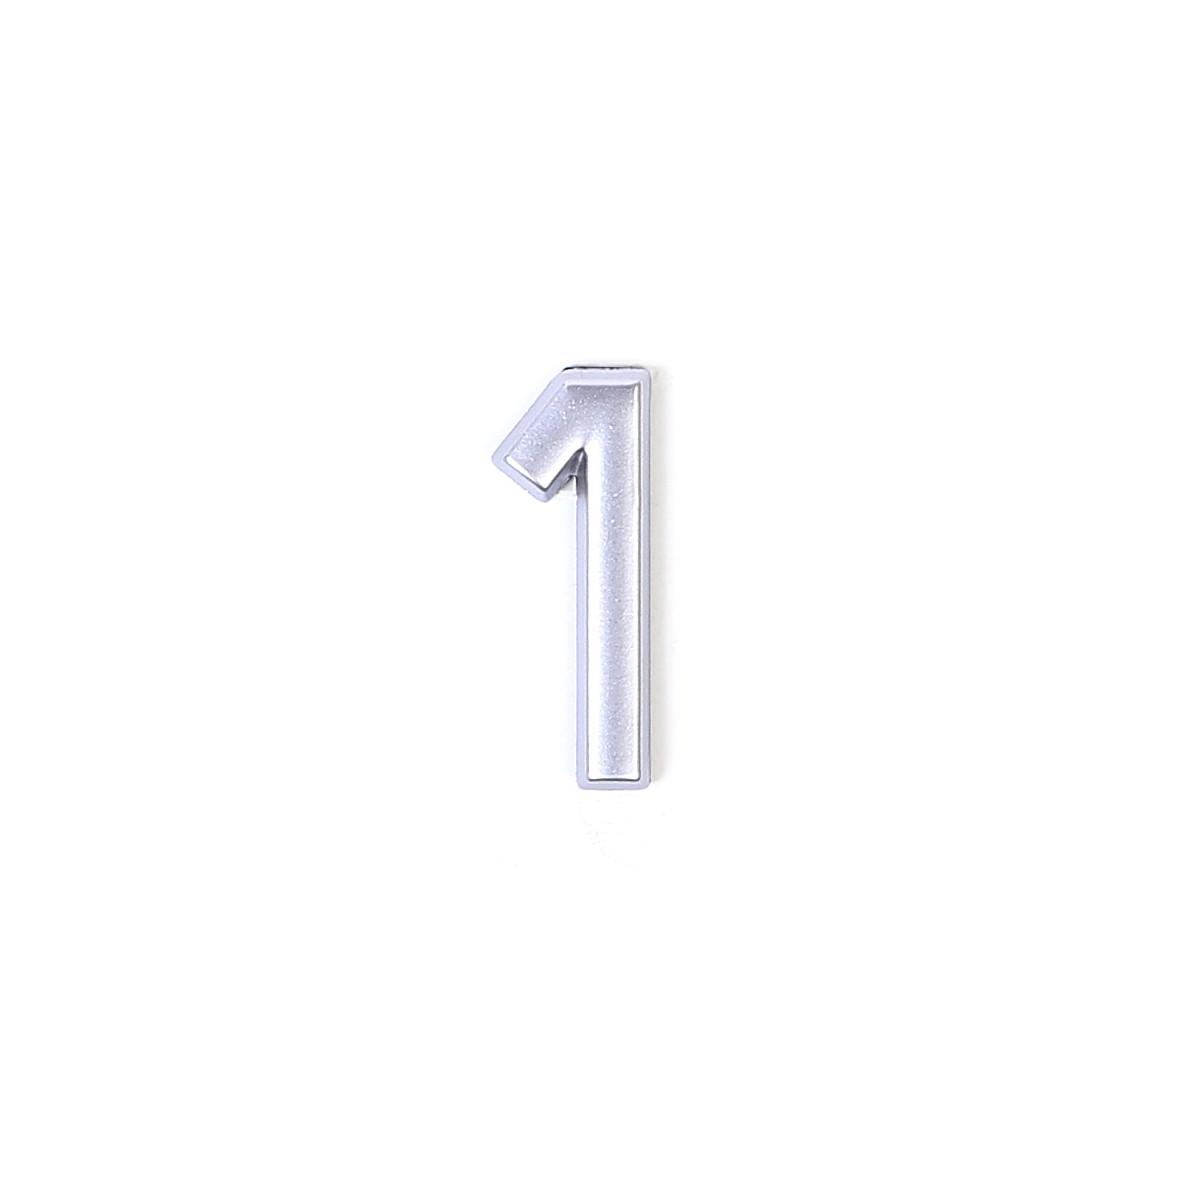 Номер на дверь Larvij цифра 1 матовое серебро. Номер из пластика (LNP4MS#1)